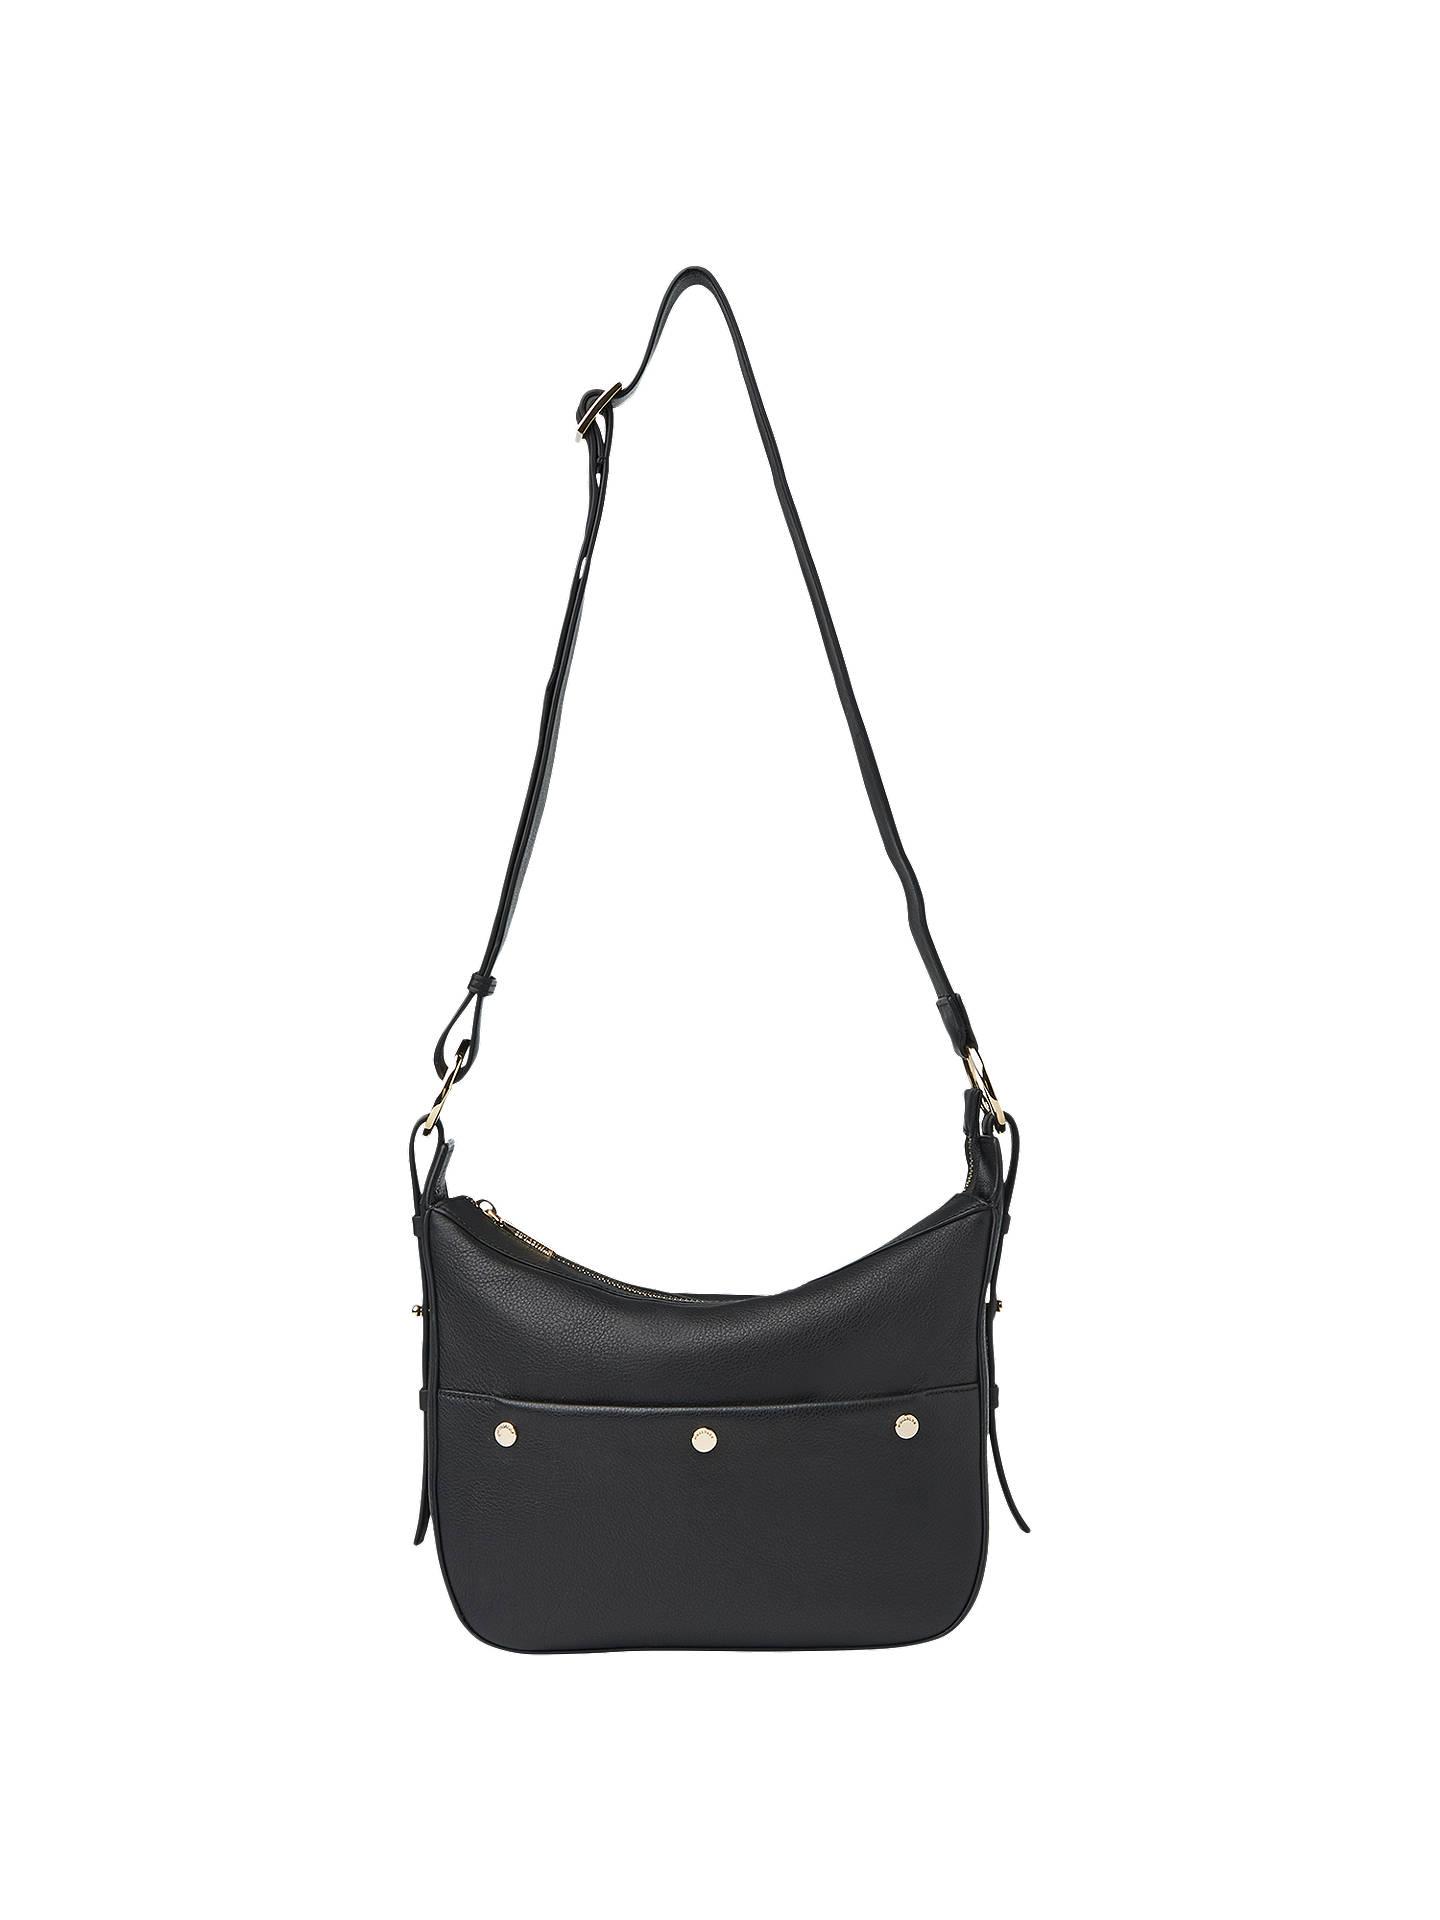 636adb9a8925 BuyWhistles Arlo Leather Triple Stud Shoulder Bag